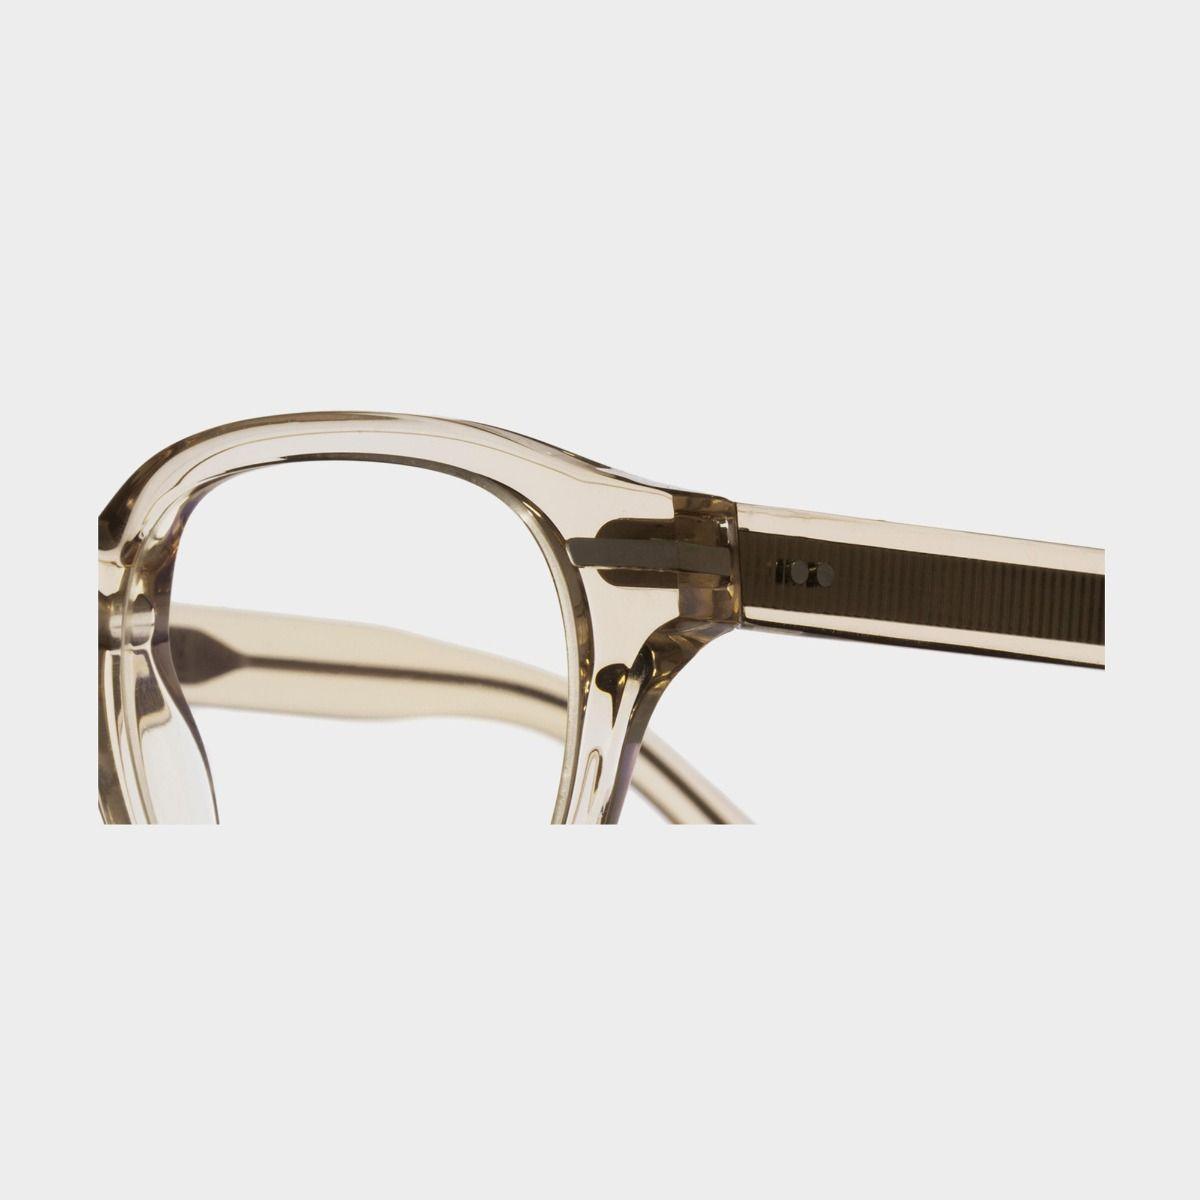 1356 Optical Round Glasses-Granny Chic